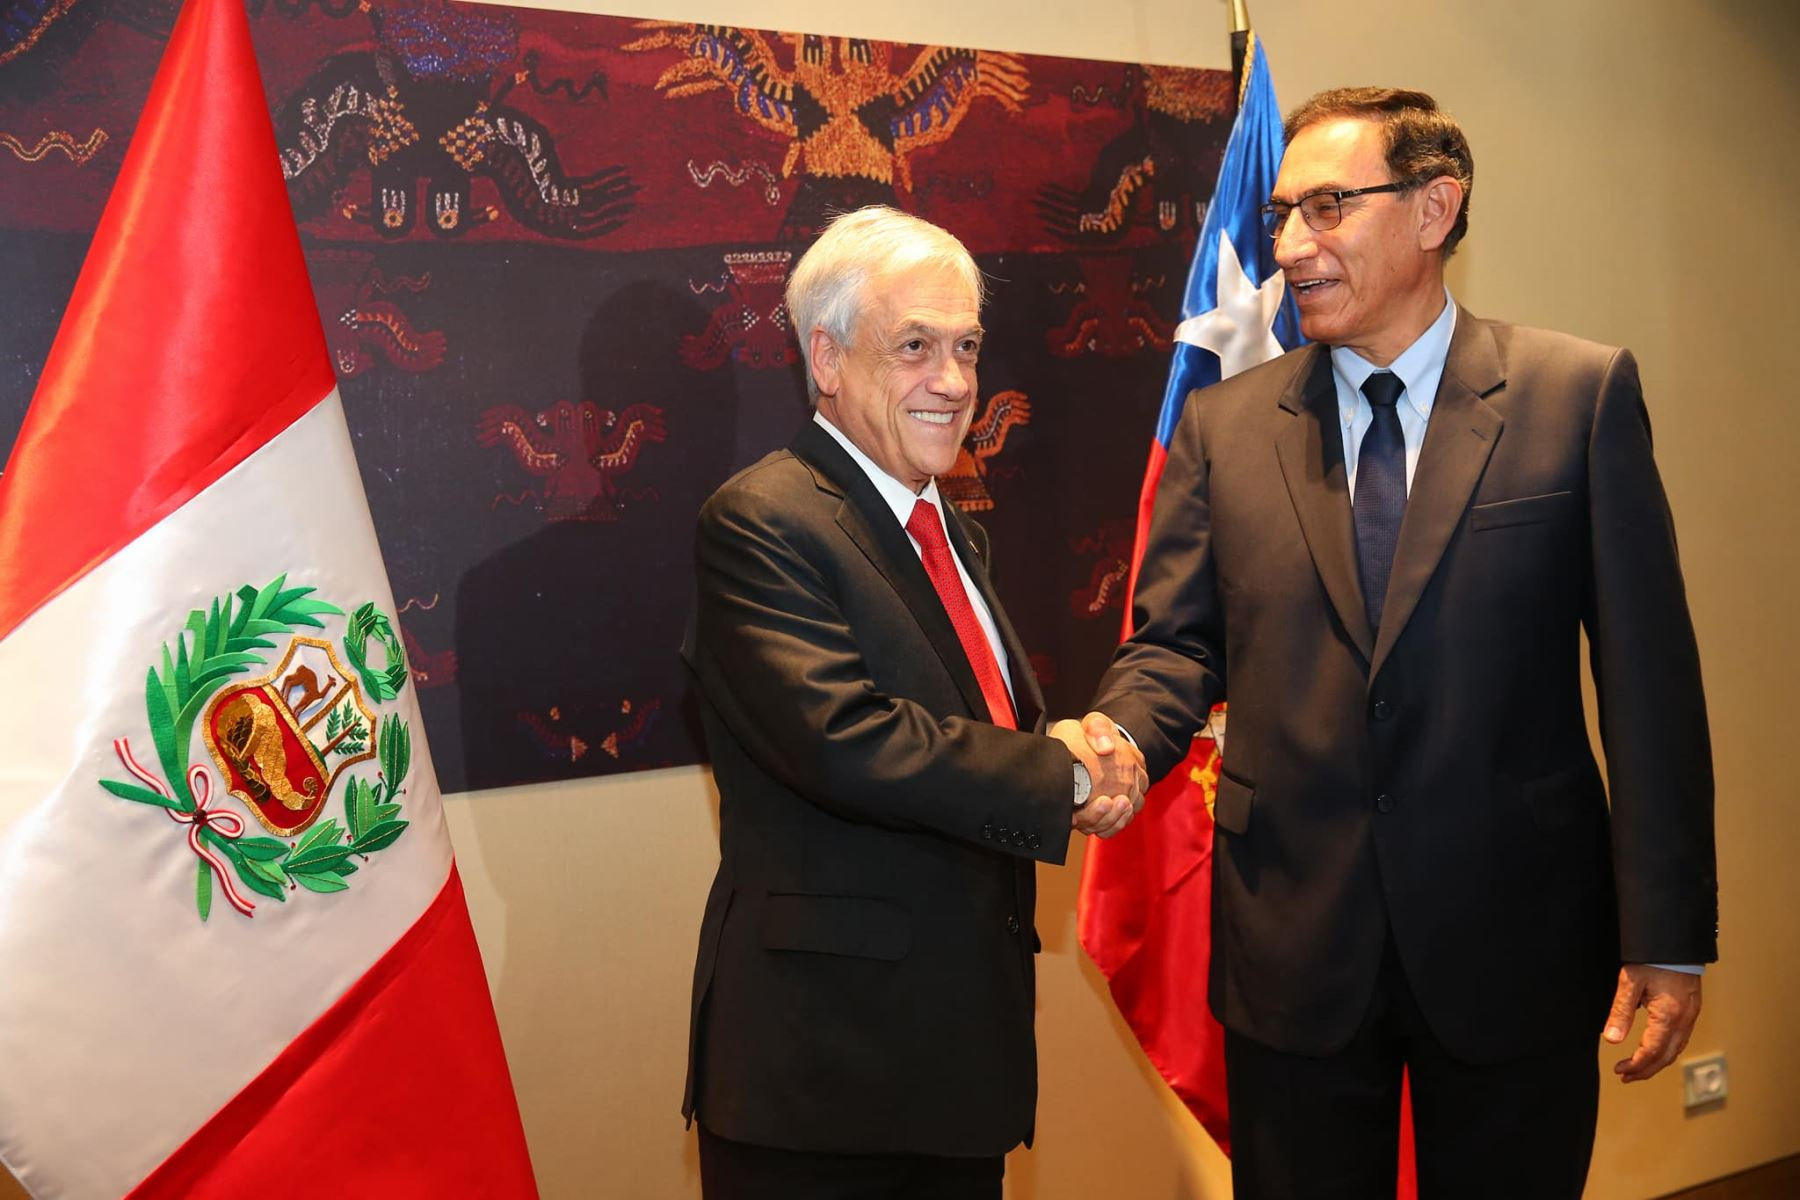 Presidente Martín Vizcarra se reúne con su homólogo chileno, Sebastián Piñera. Foto: ANDINA/Prensa Presidencia.